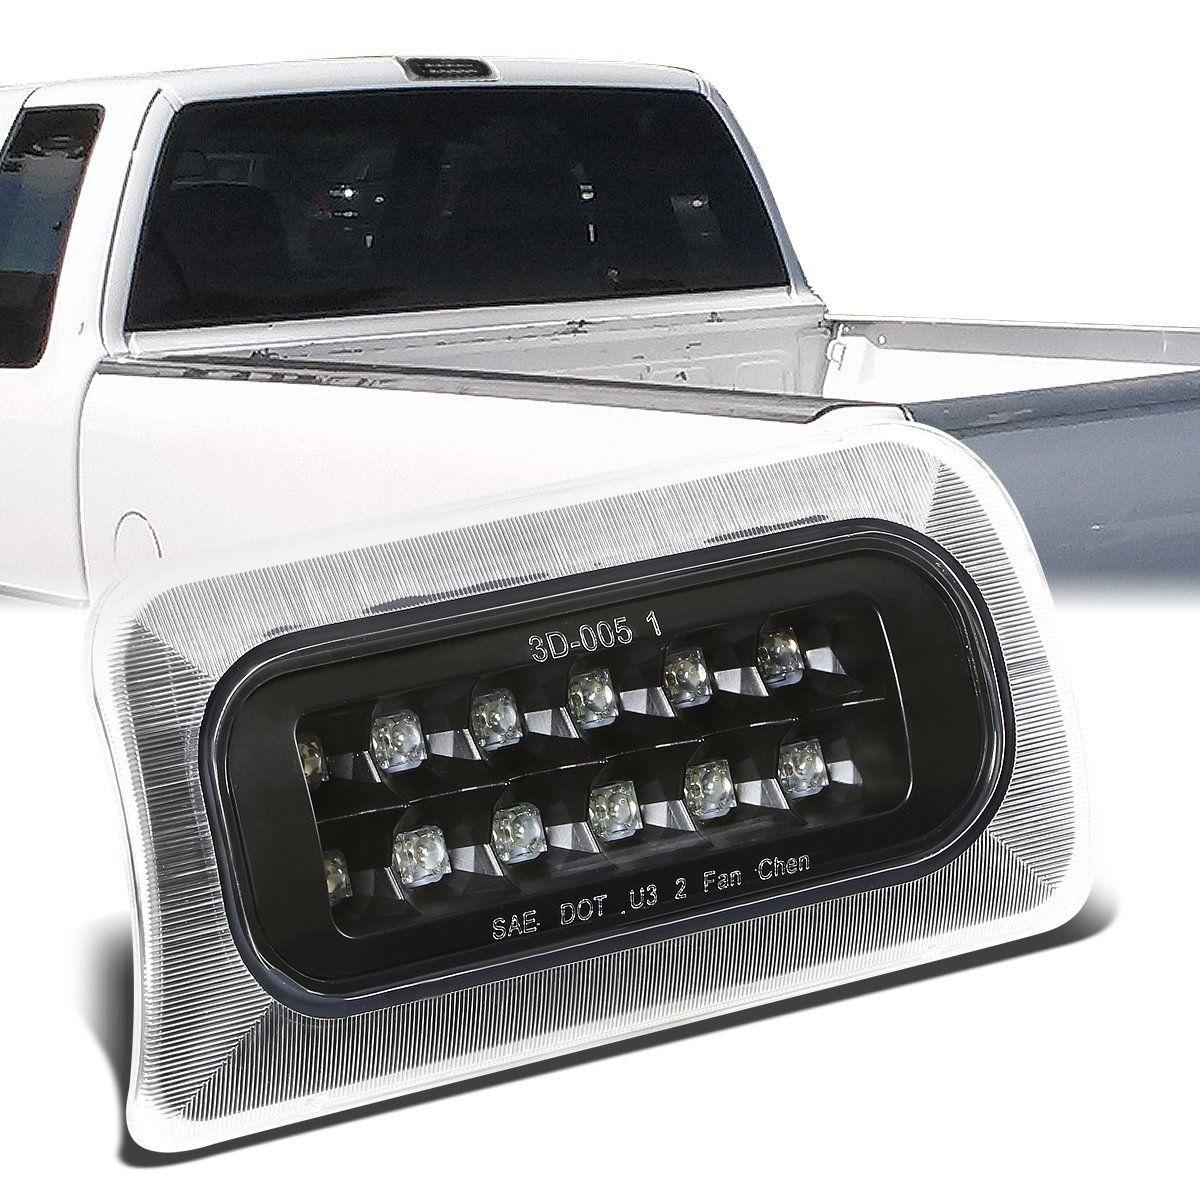 94 03 Chevy S10 Gmc Sonoma Standard Cab Led Third 3rd Tail Brake Light Black Housing Chevy S10 Led Gmc